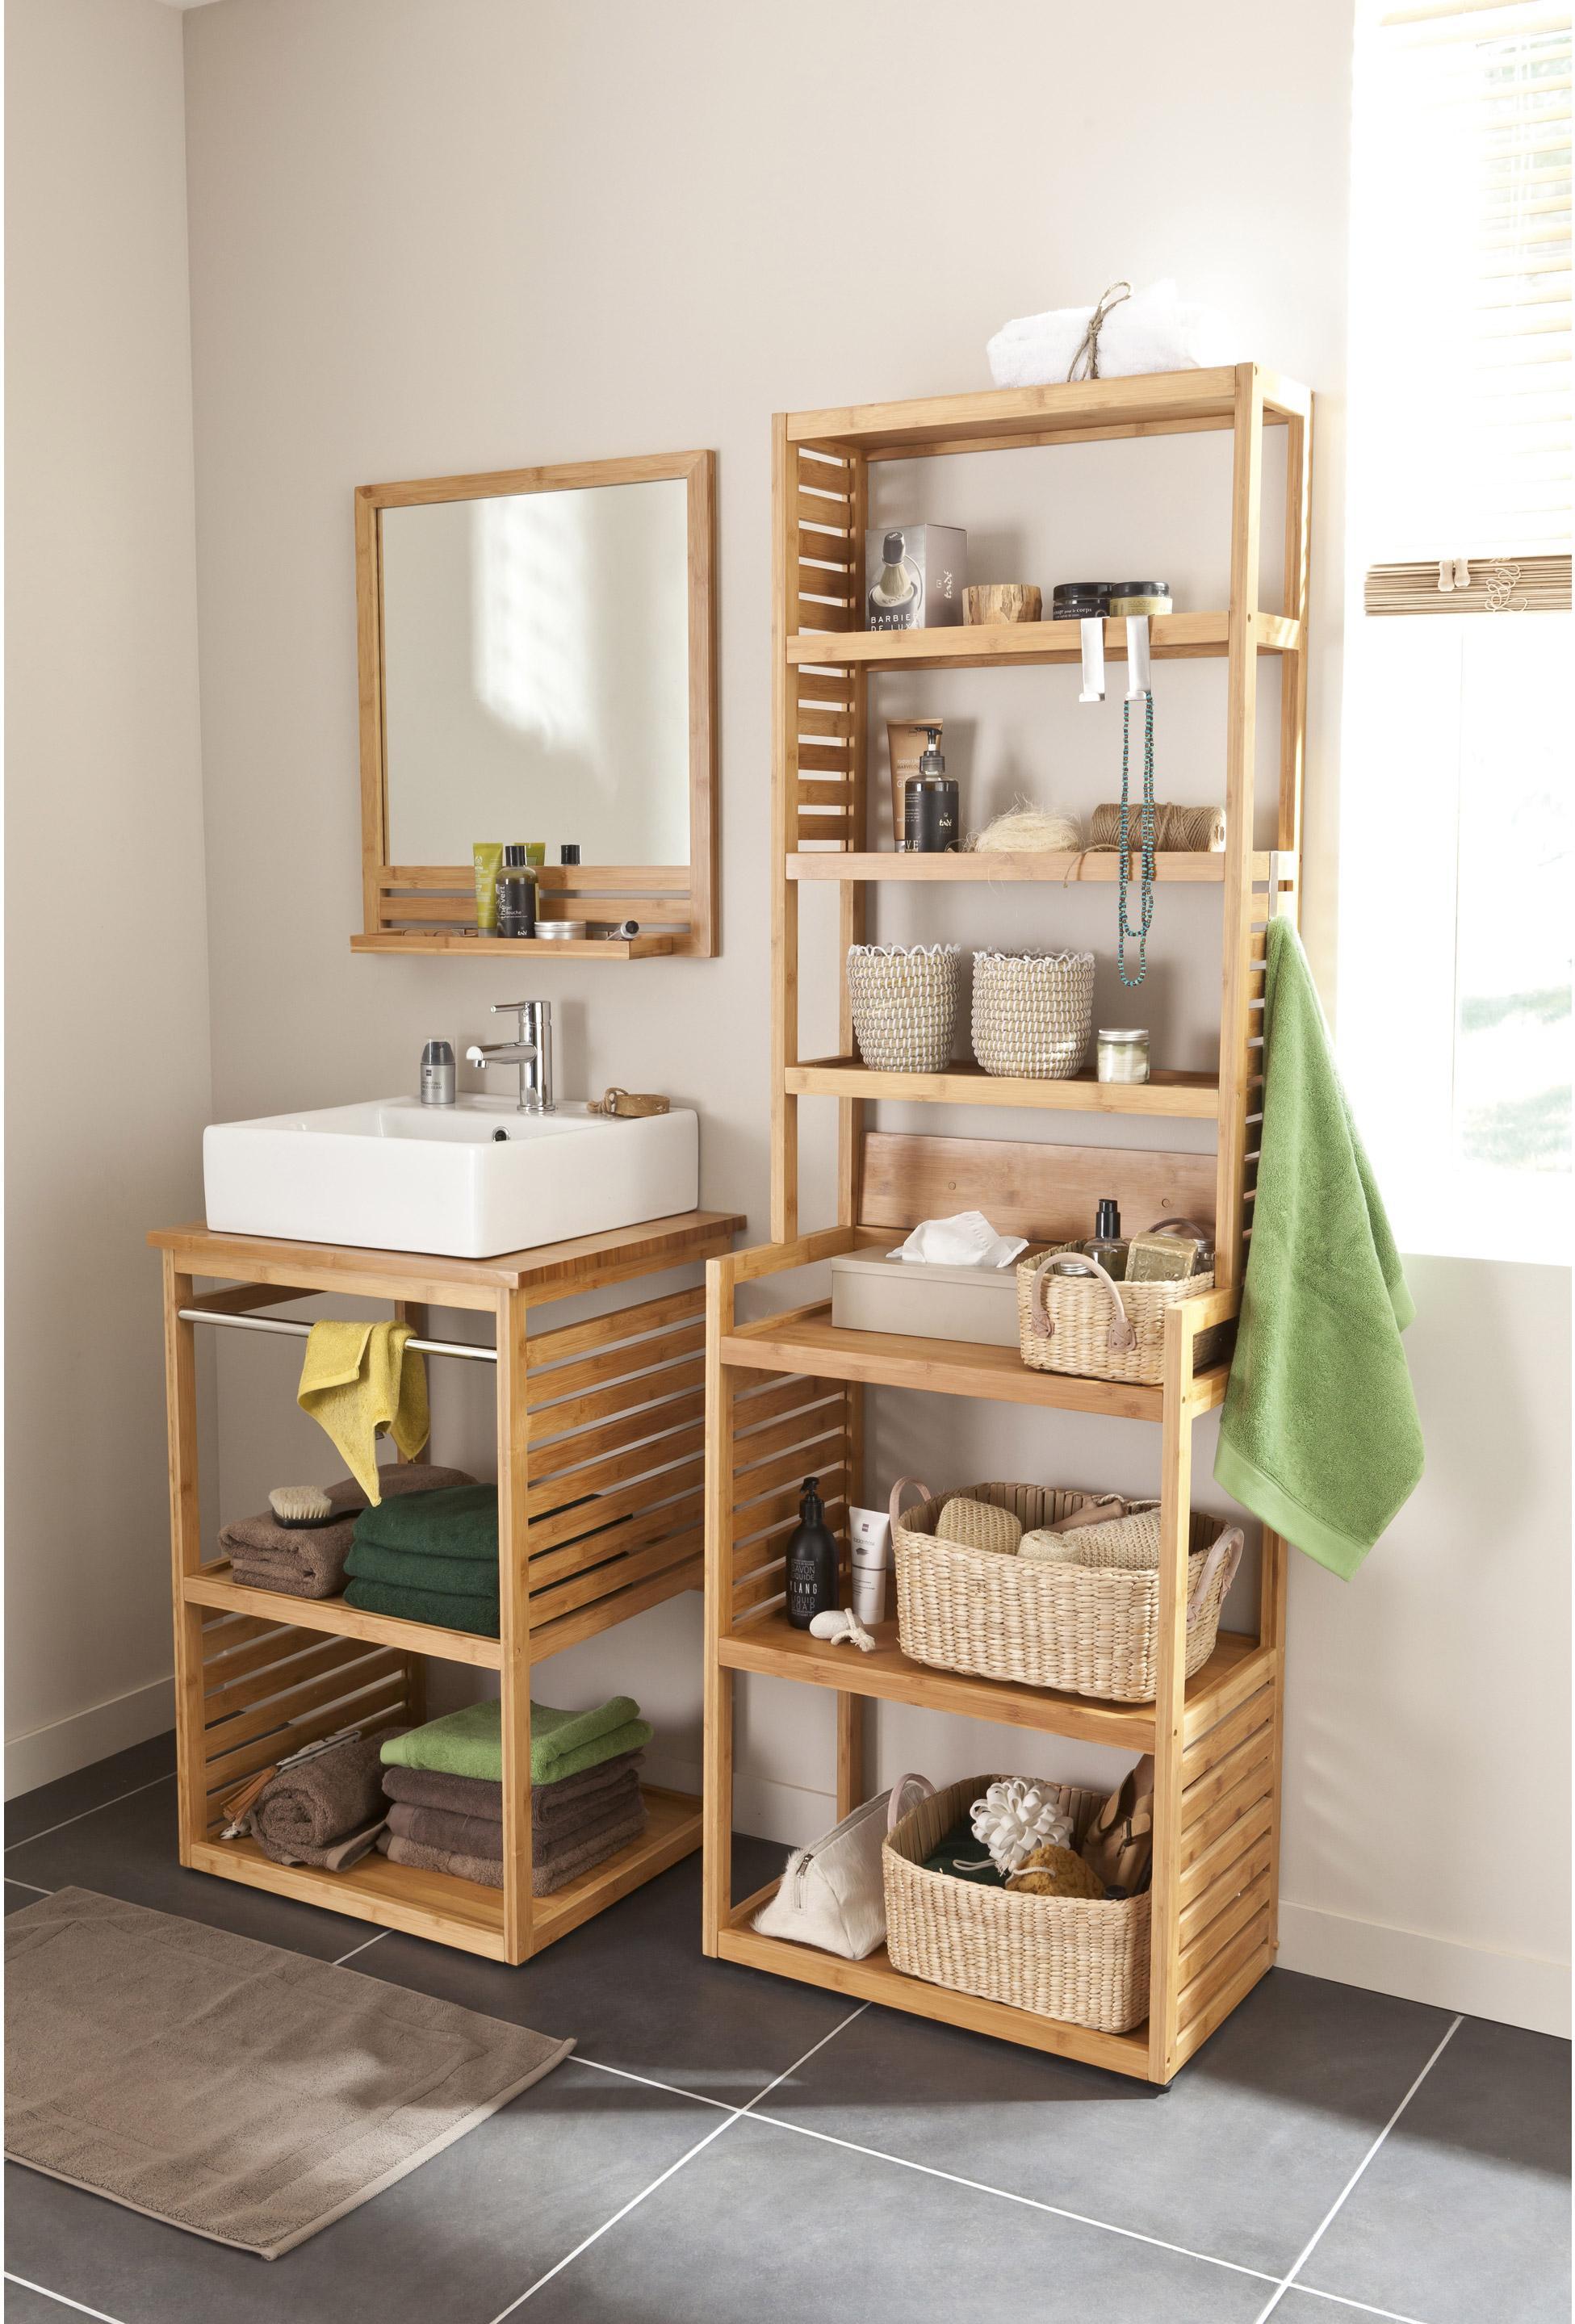 Pin By Lok Yee On Home Bathroom Furniture Inspiration Diy Bathroom Decor Small Space Interior Design